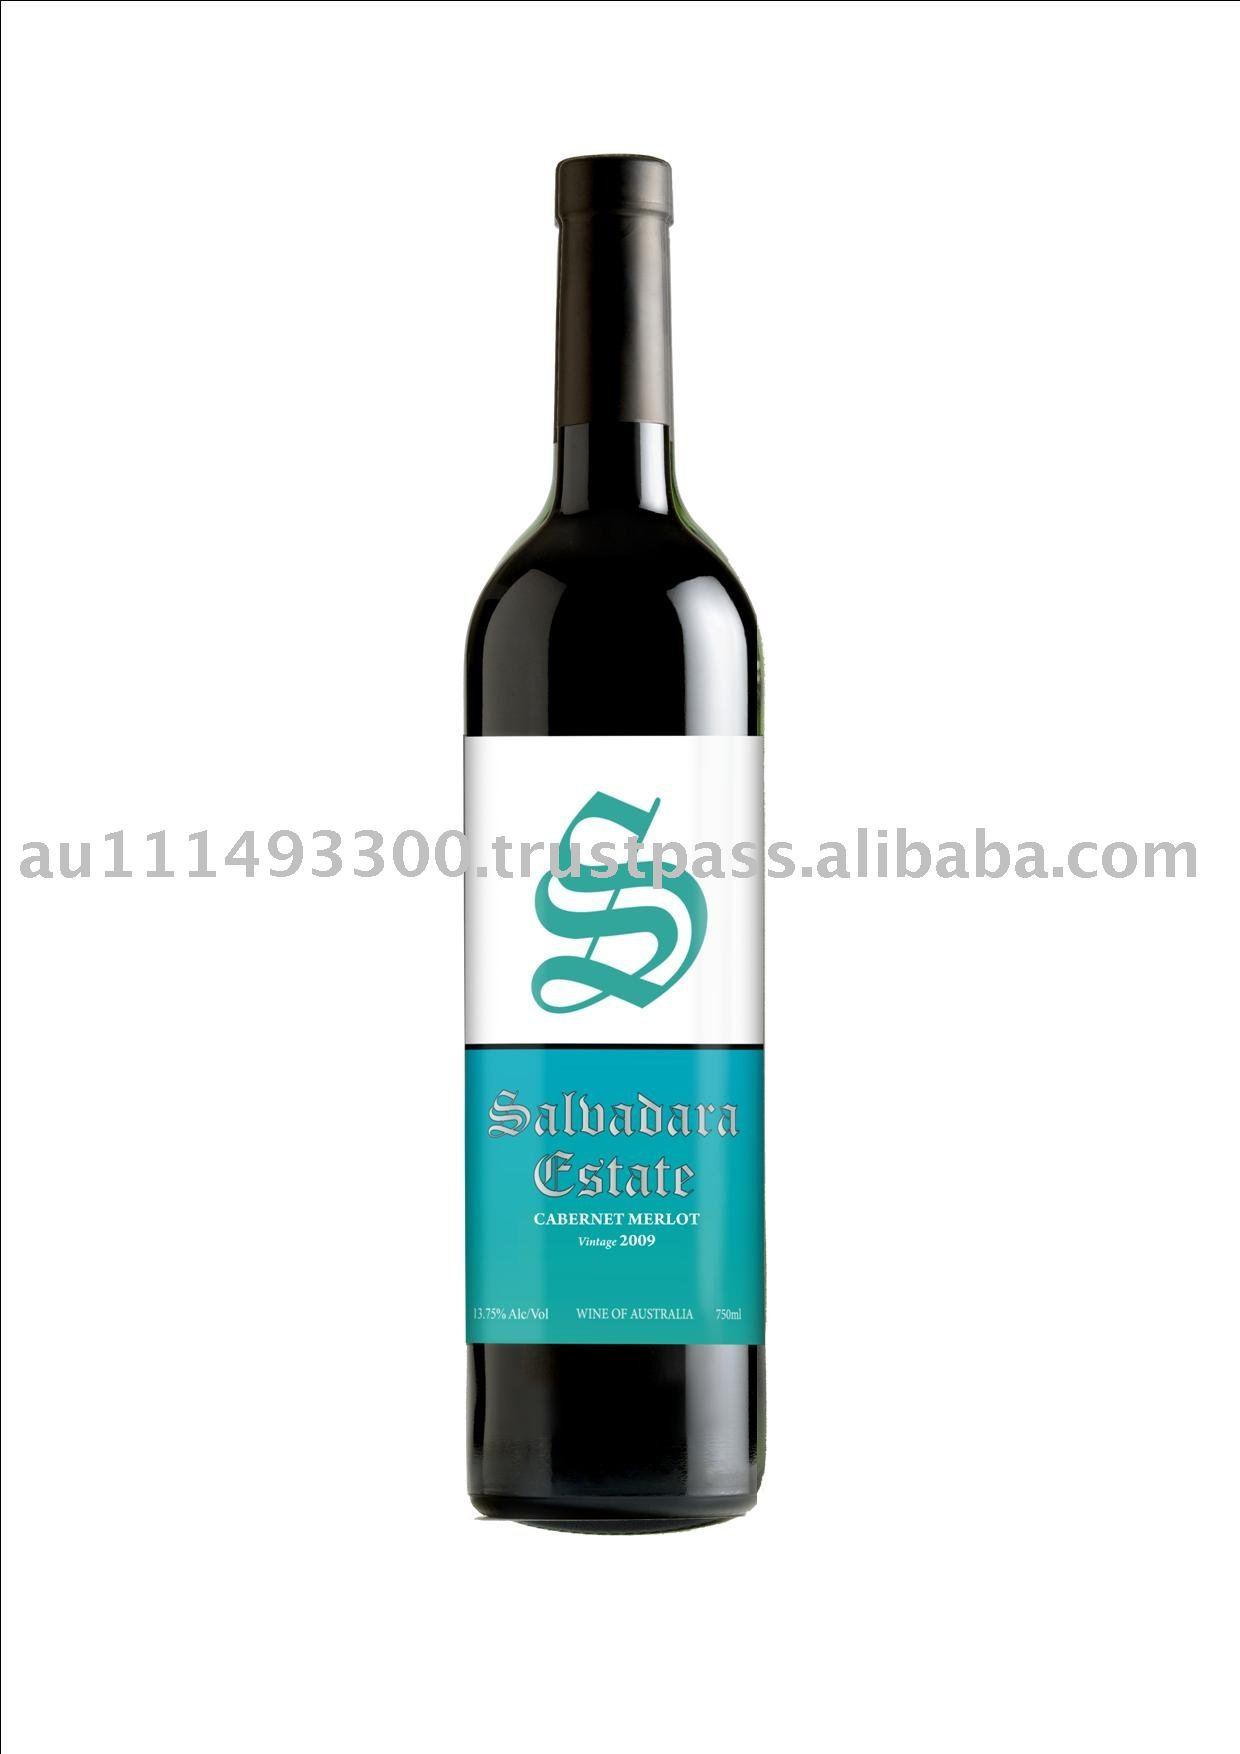 Australian Red Wine (Cabernet Merlot)